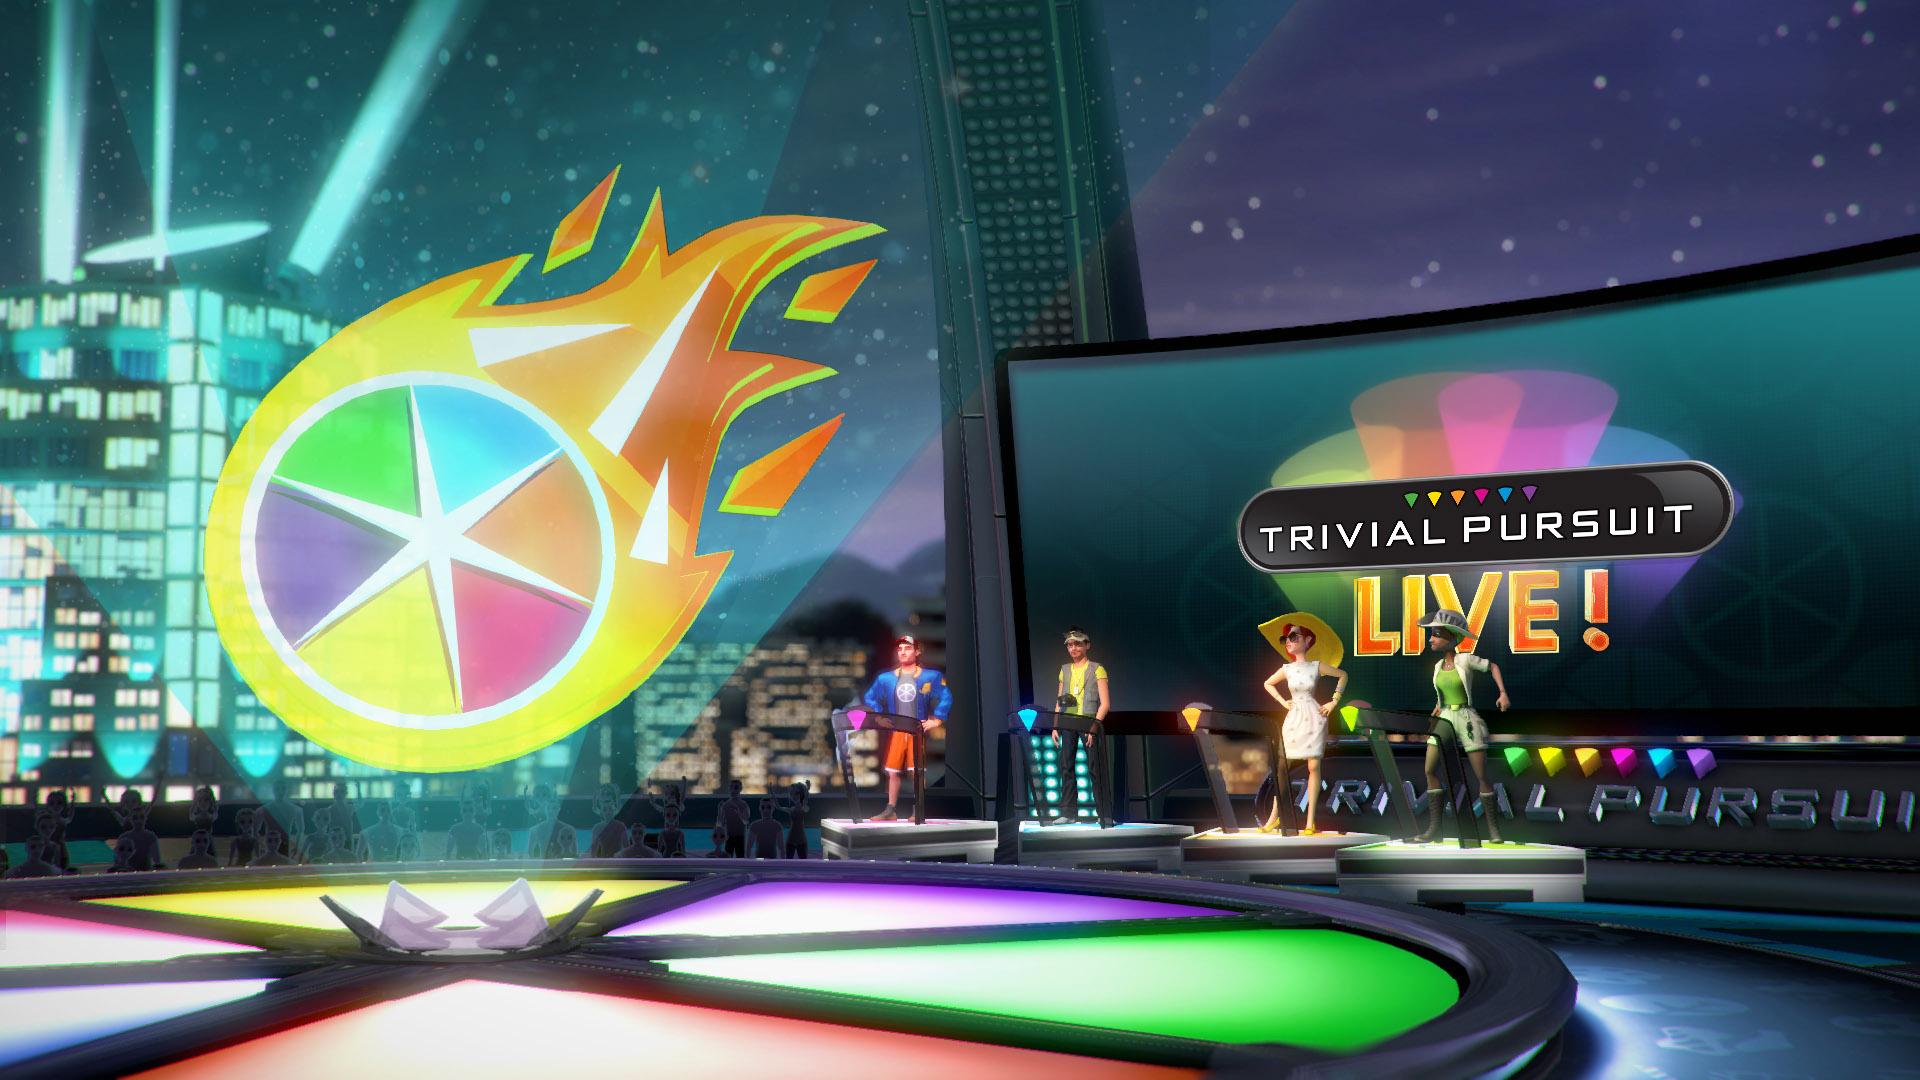 HGC Trivial Pursuit Screens 3